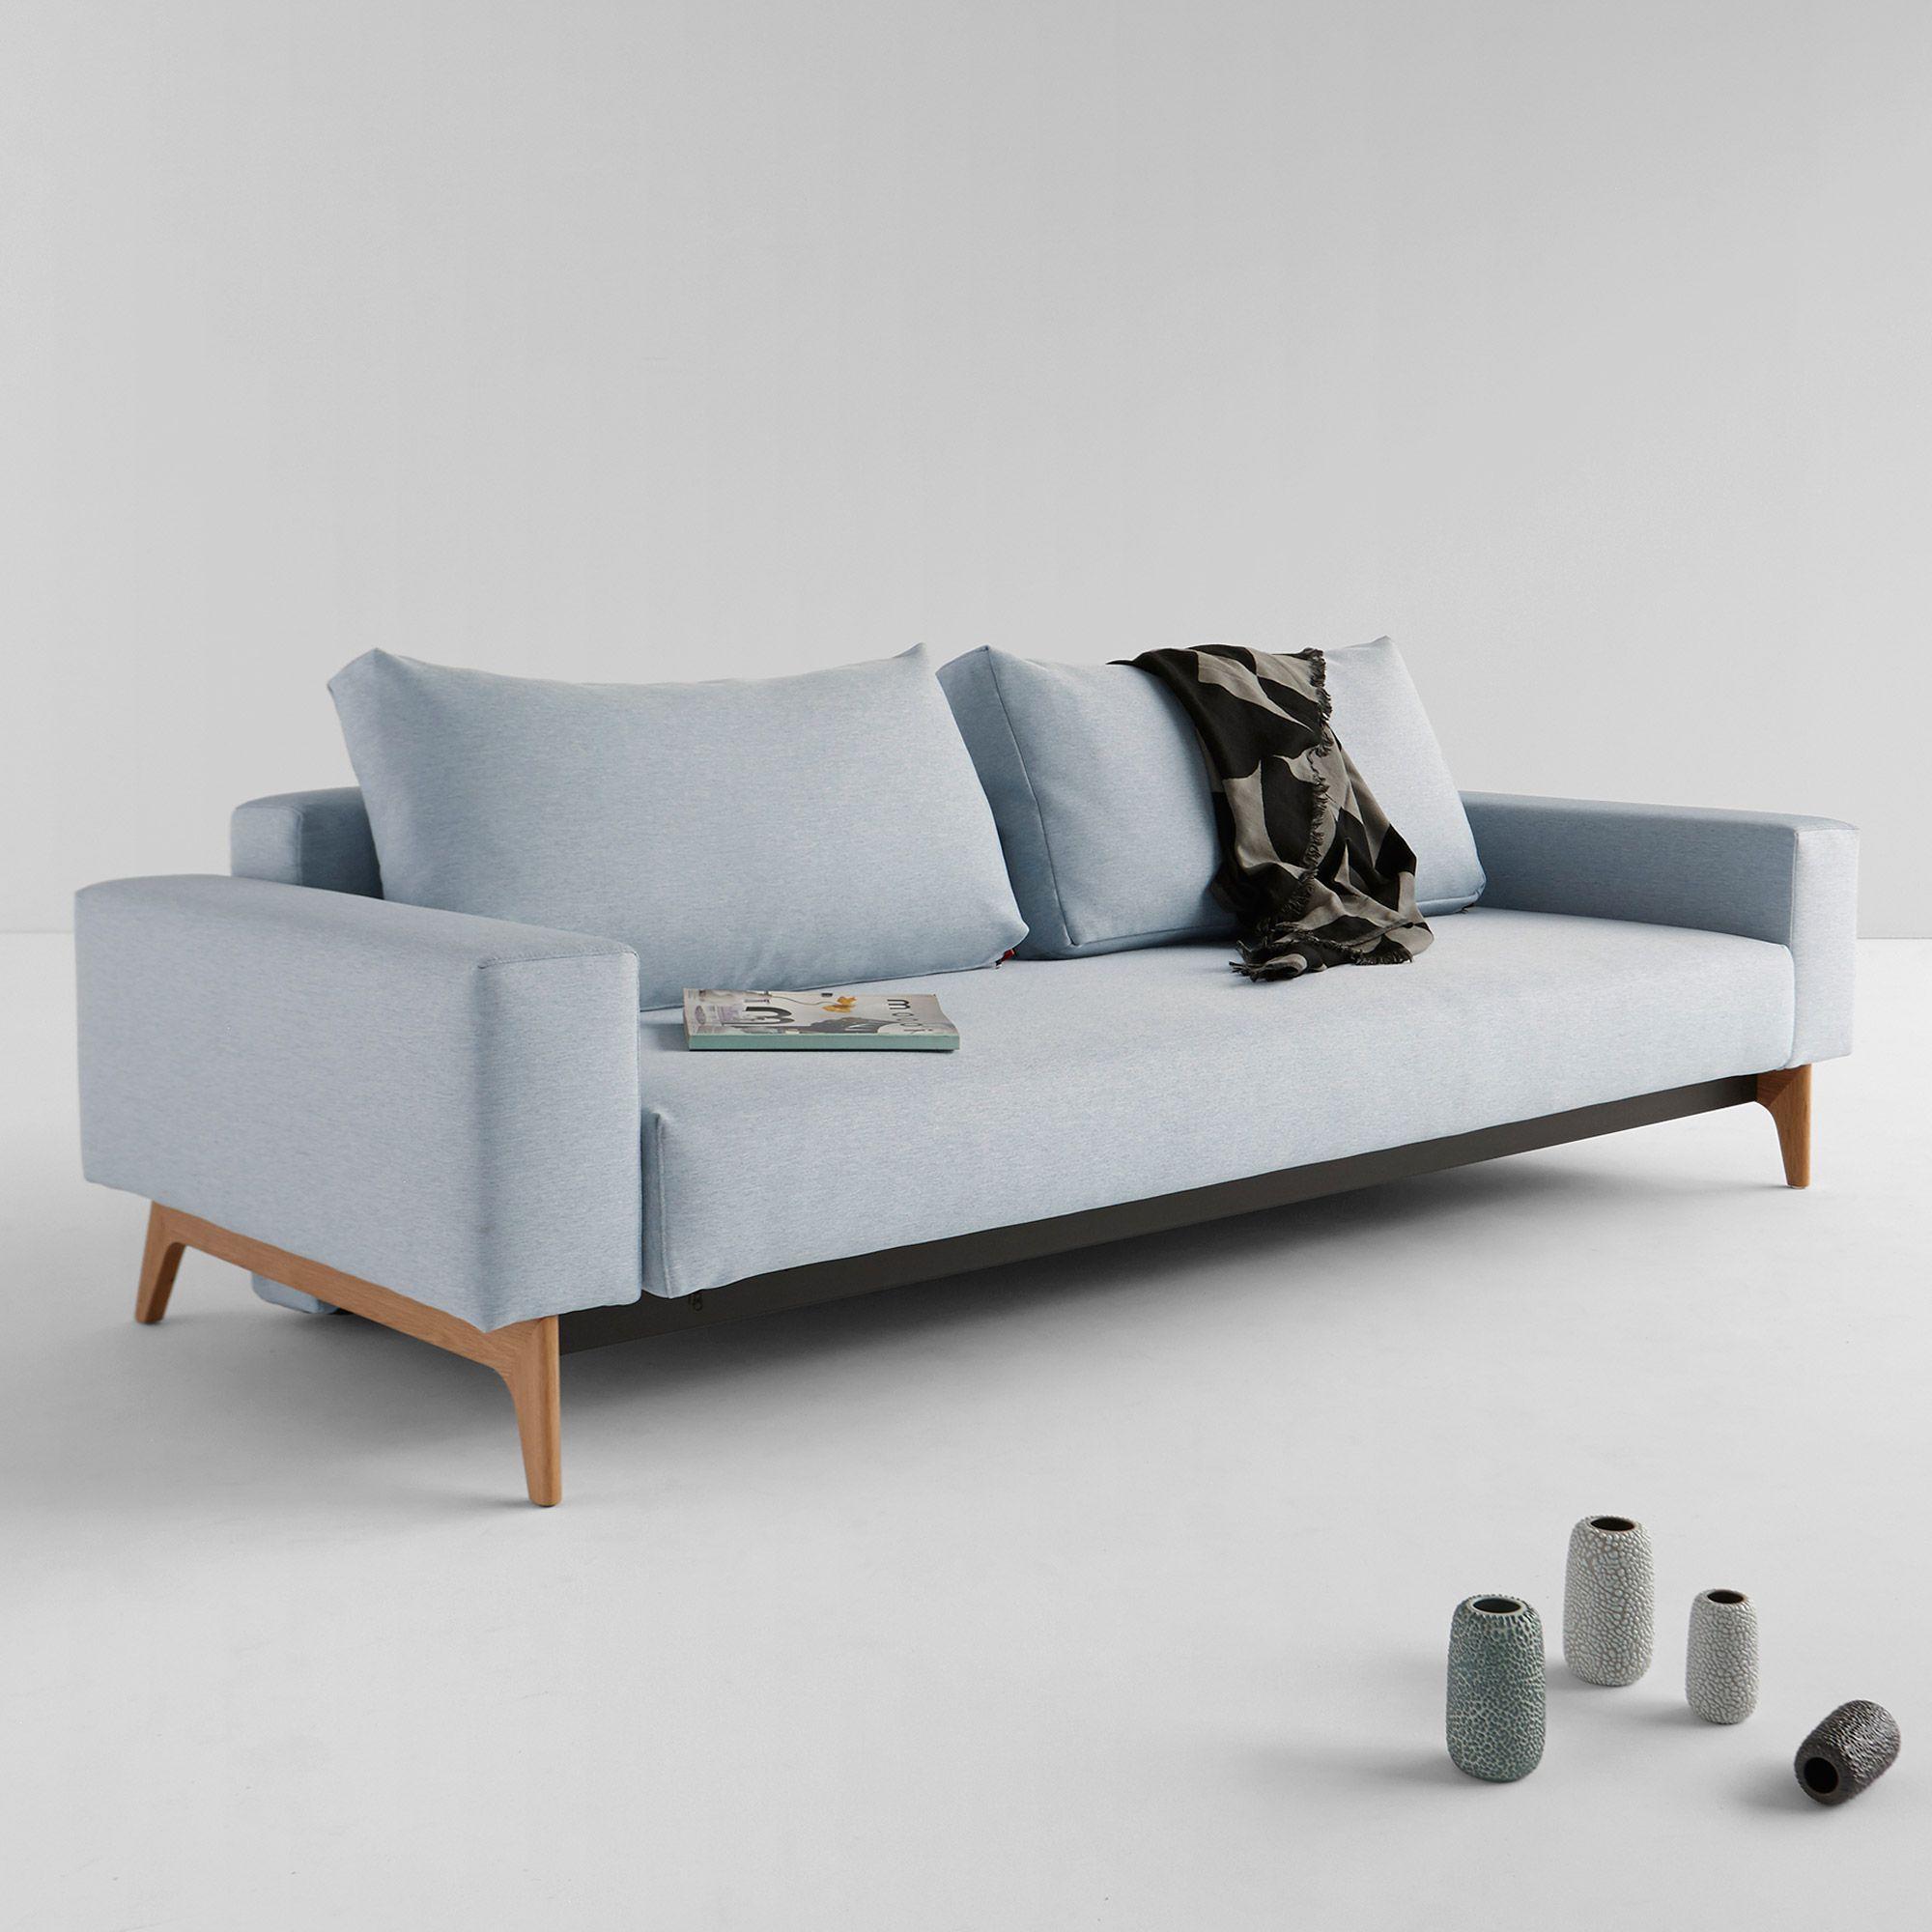 Canapé convertible en tissu avec pieds en bois IDUN Innovation port ...